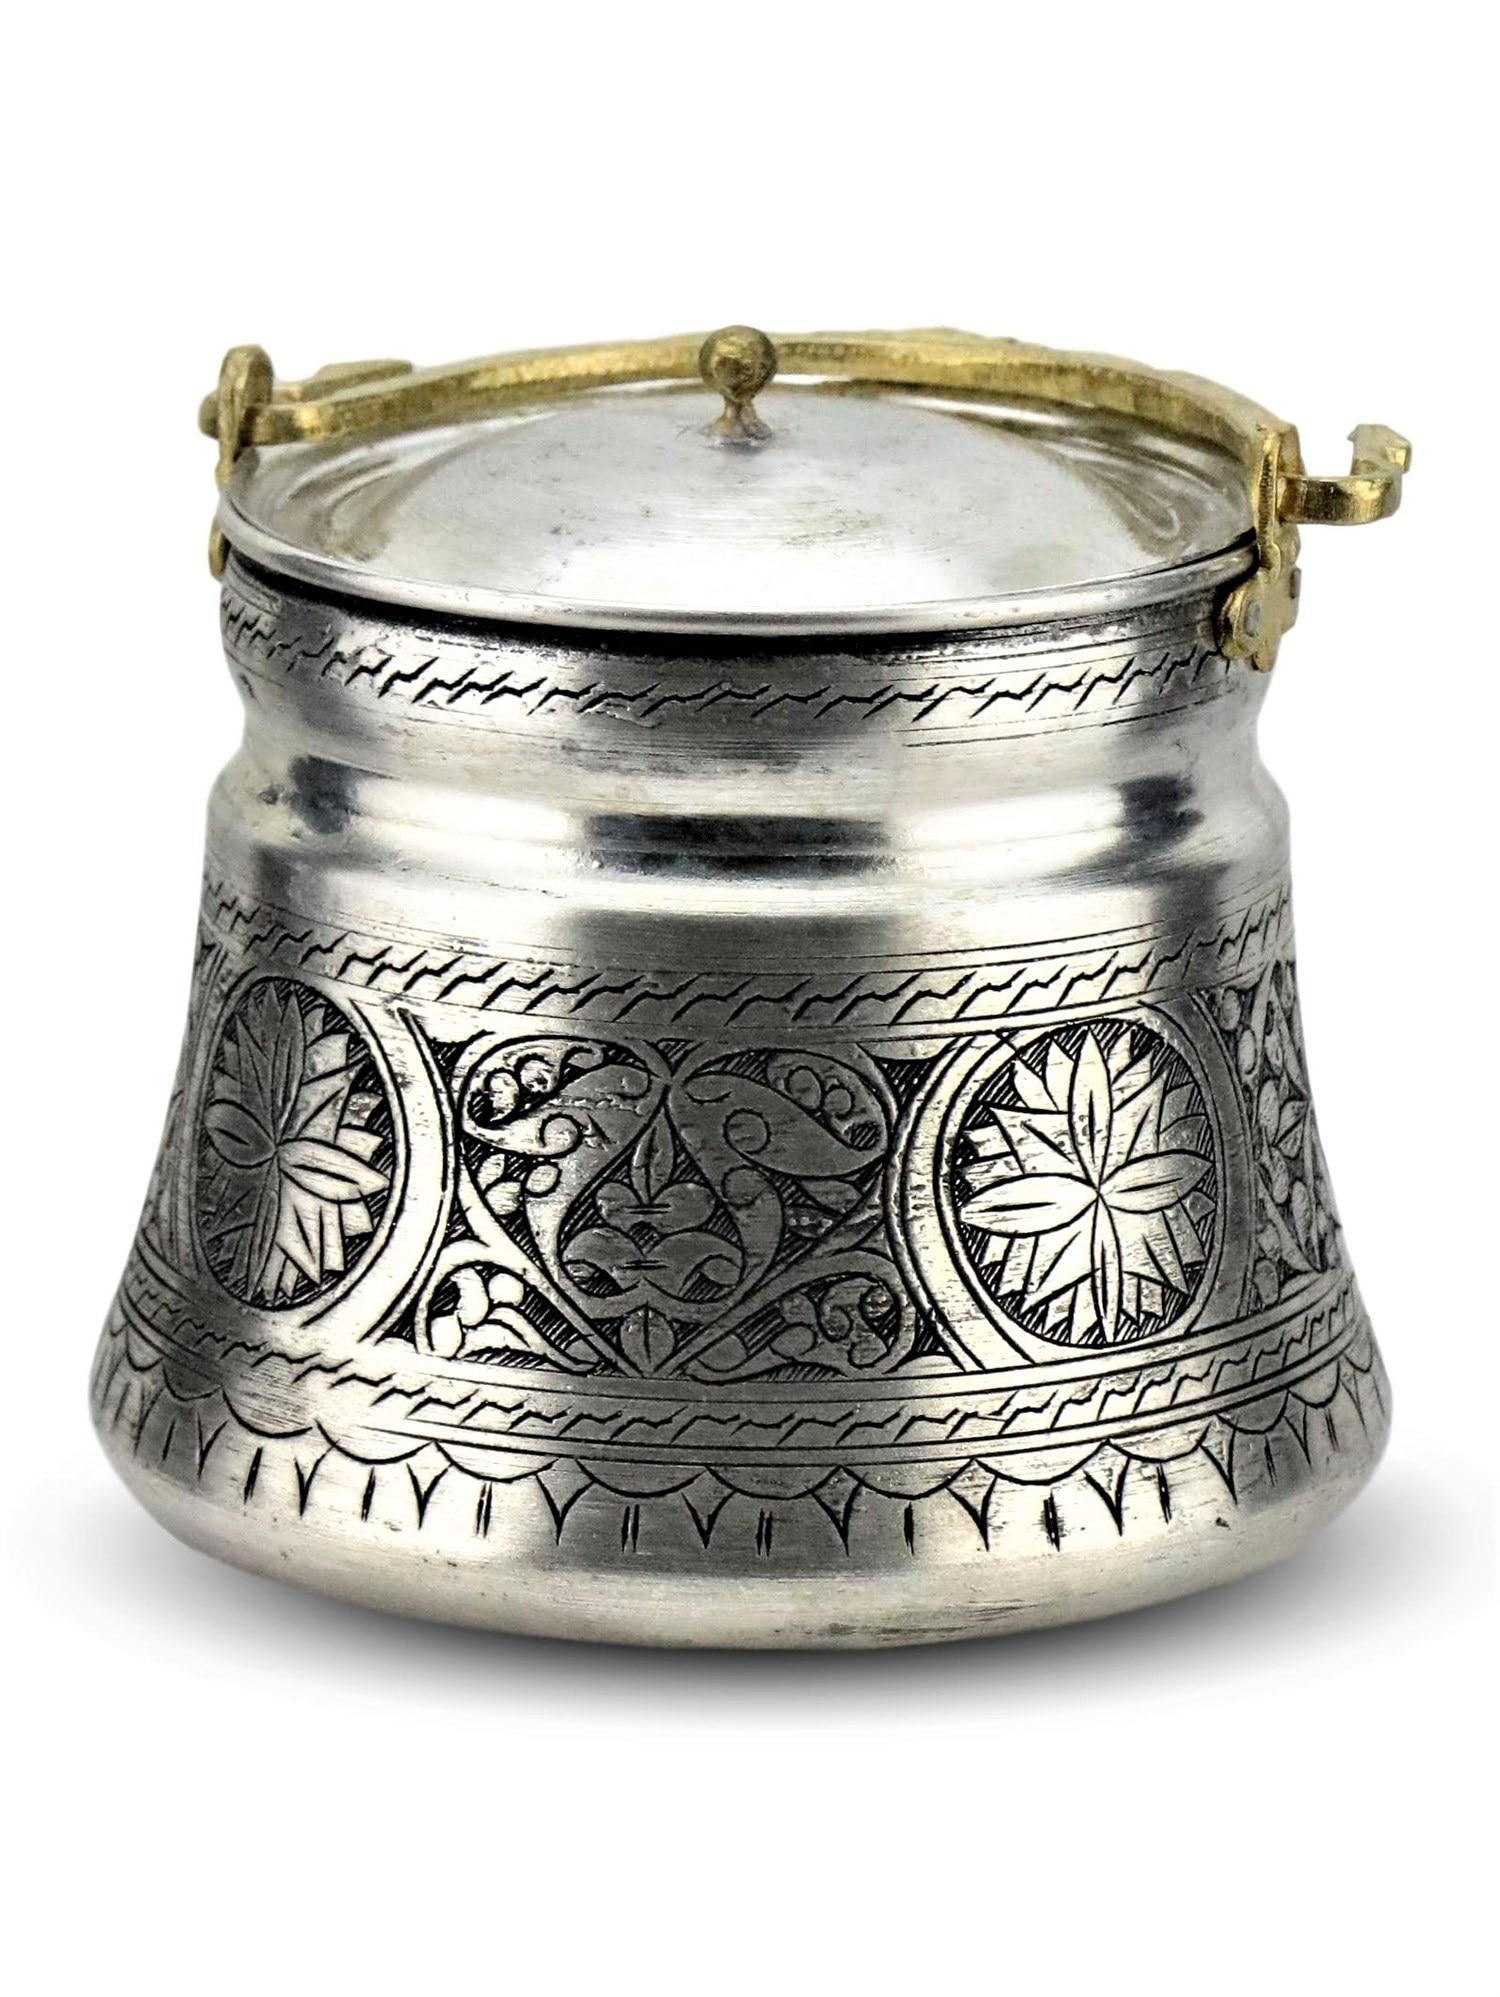 Cubo de cobre hecho a mano con tapa 1 lt Cubo de cocina resistente al calor bordado tradicional turco Anatolian otomana regalo de Estambul